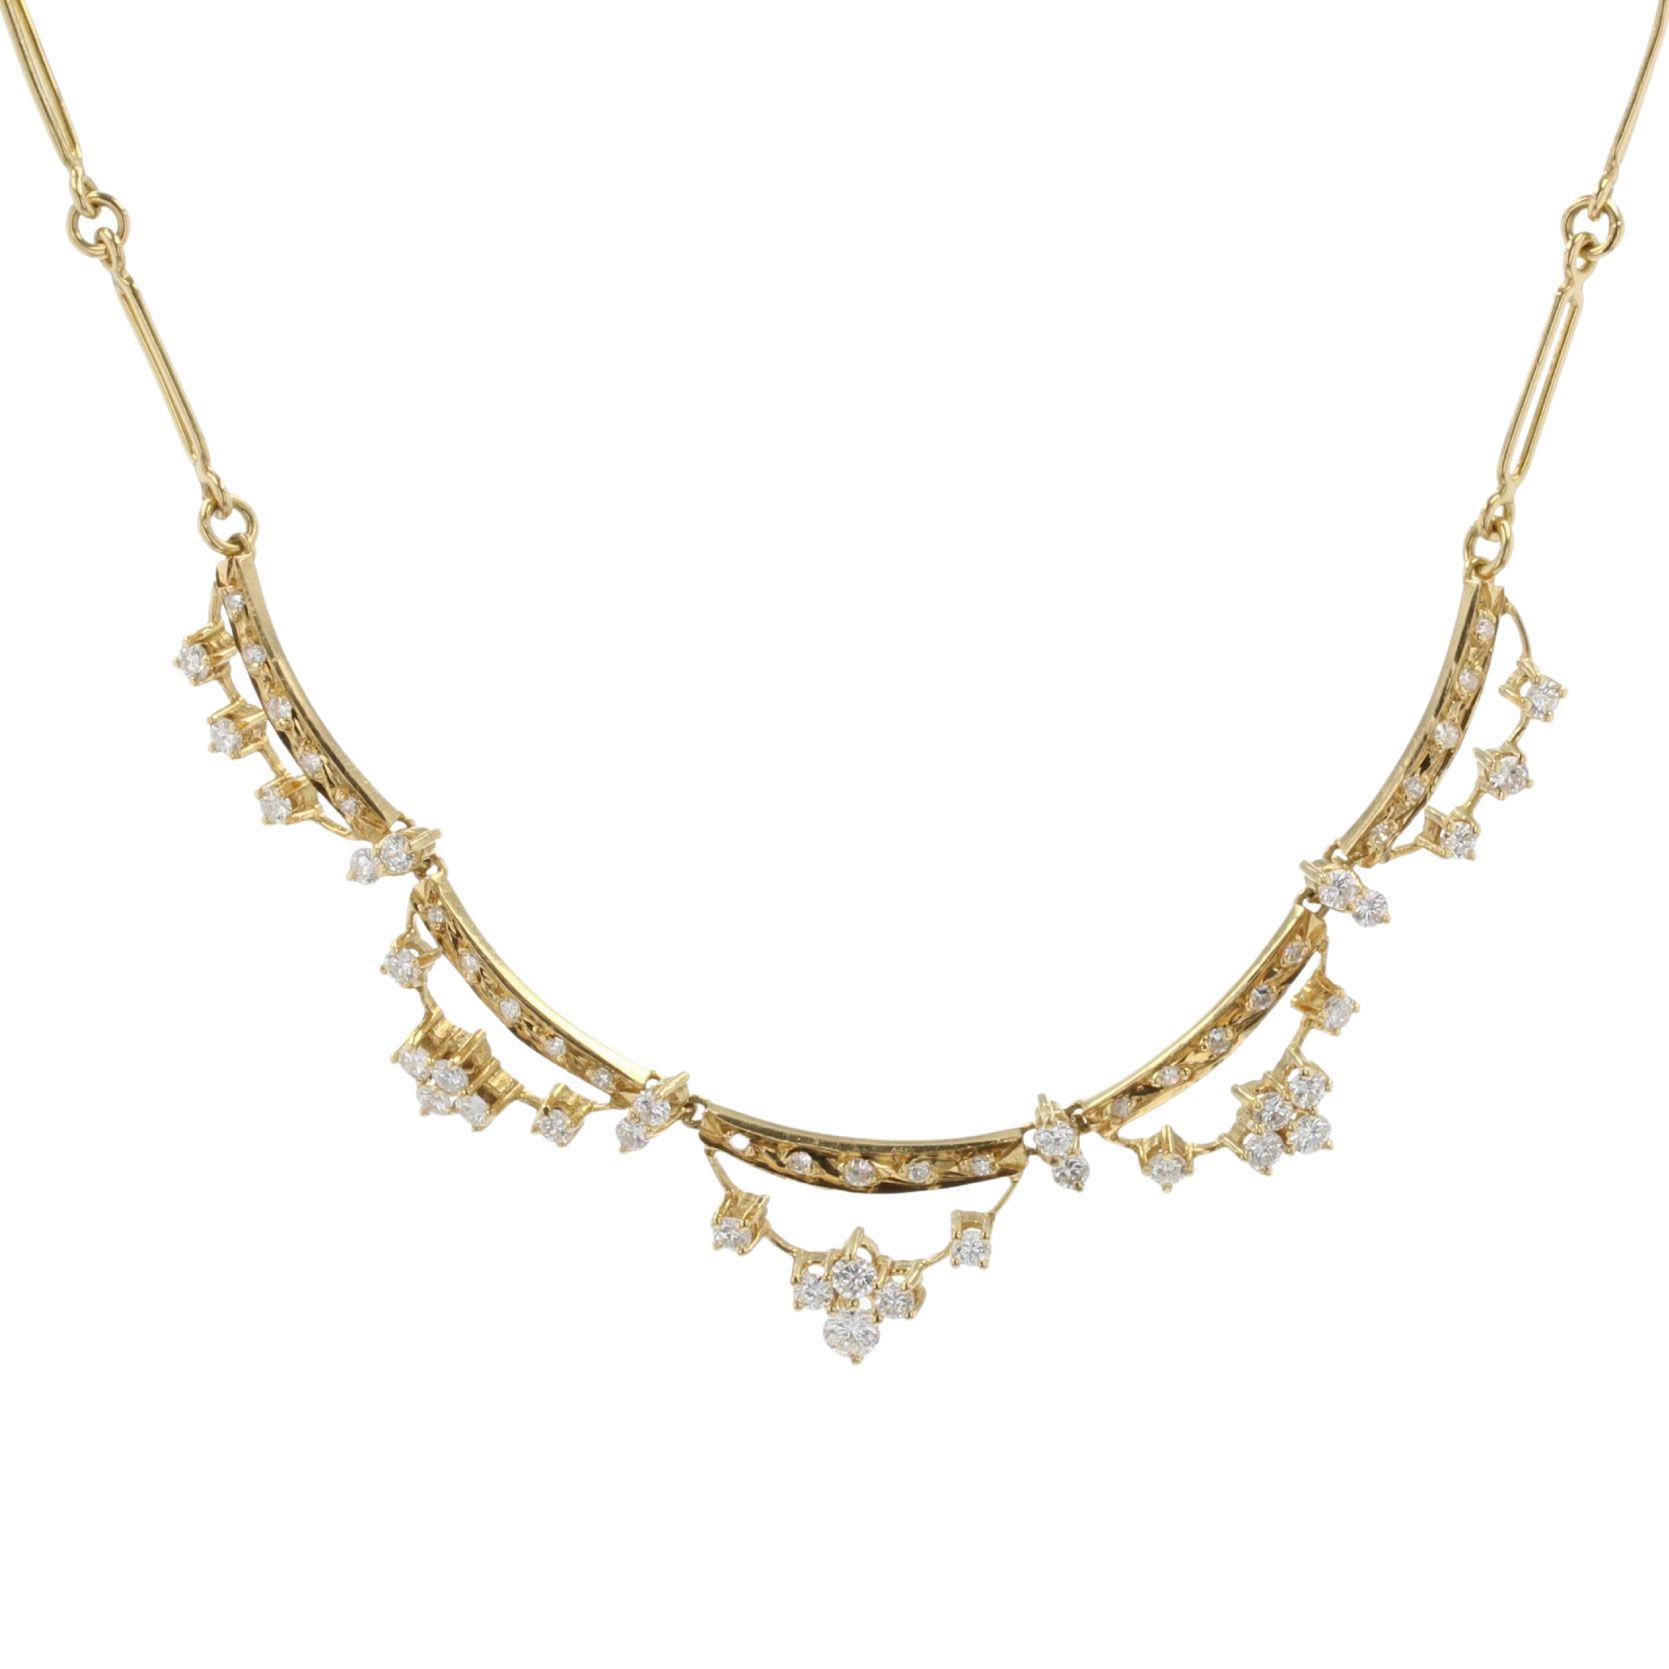 Collier diamants et or jaune collerette